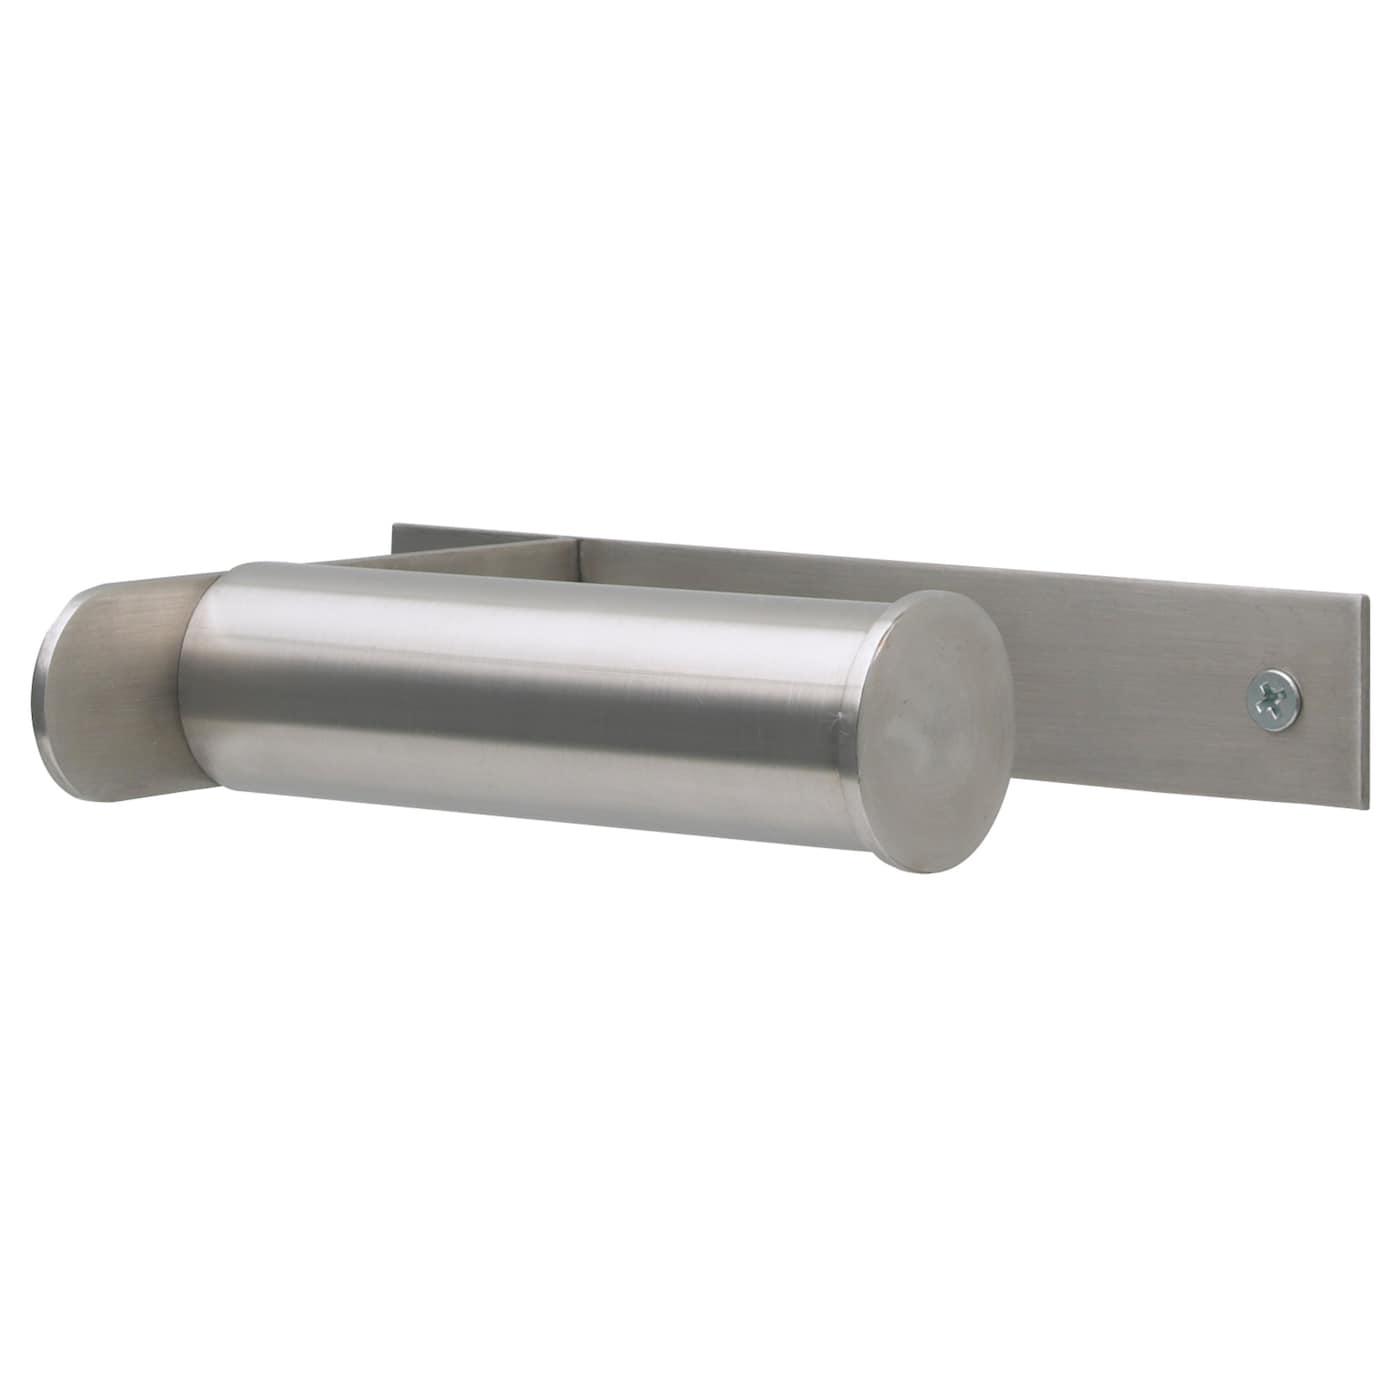 grundtal toilet roll holder stainless steel ikea. Black Bedroom Furniture Sets. Home Design Ideas